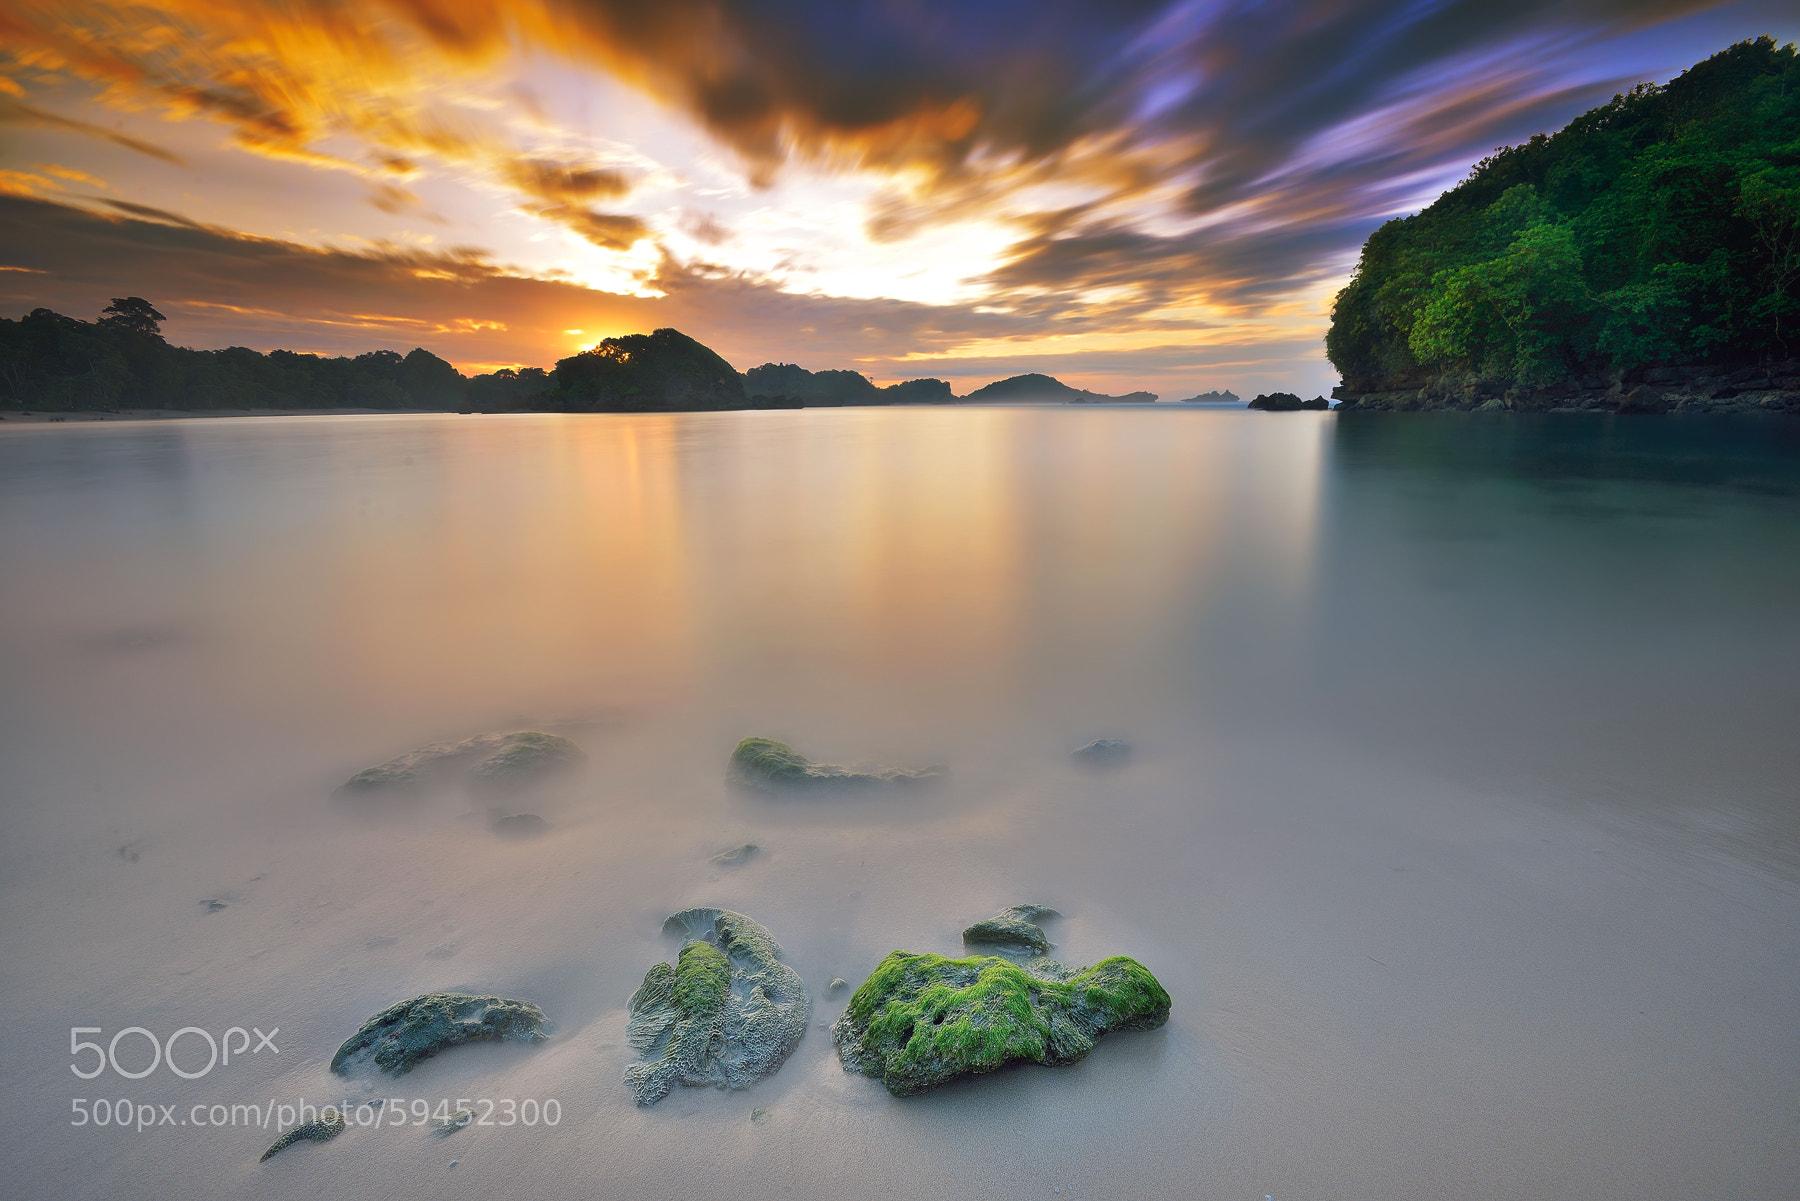 Photograph Morning at Kondang Merak by Eep Ependi on 500px